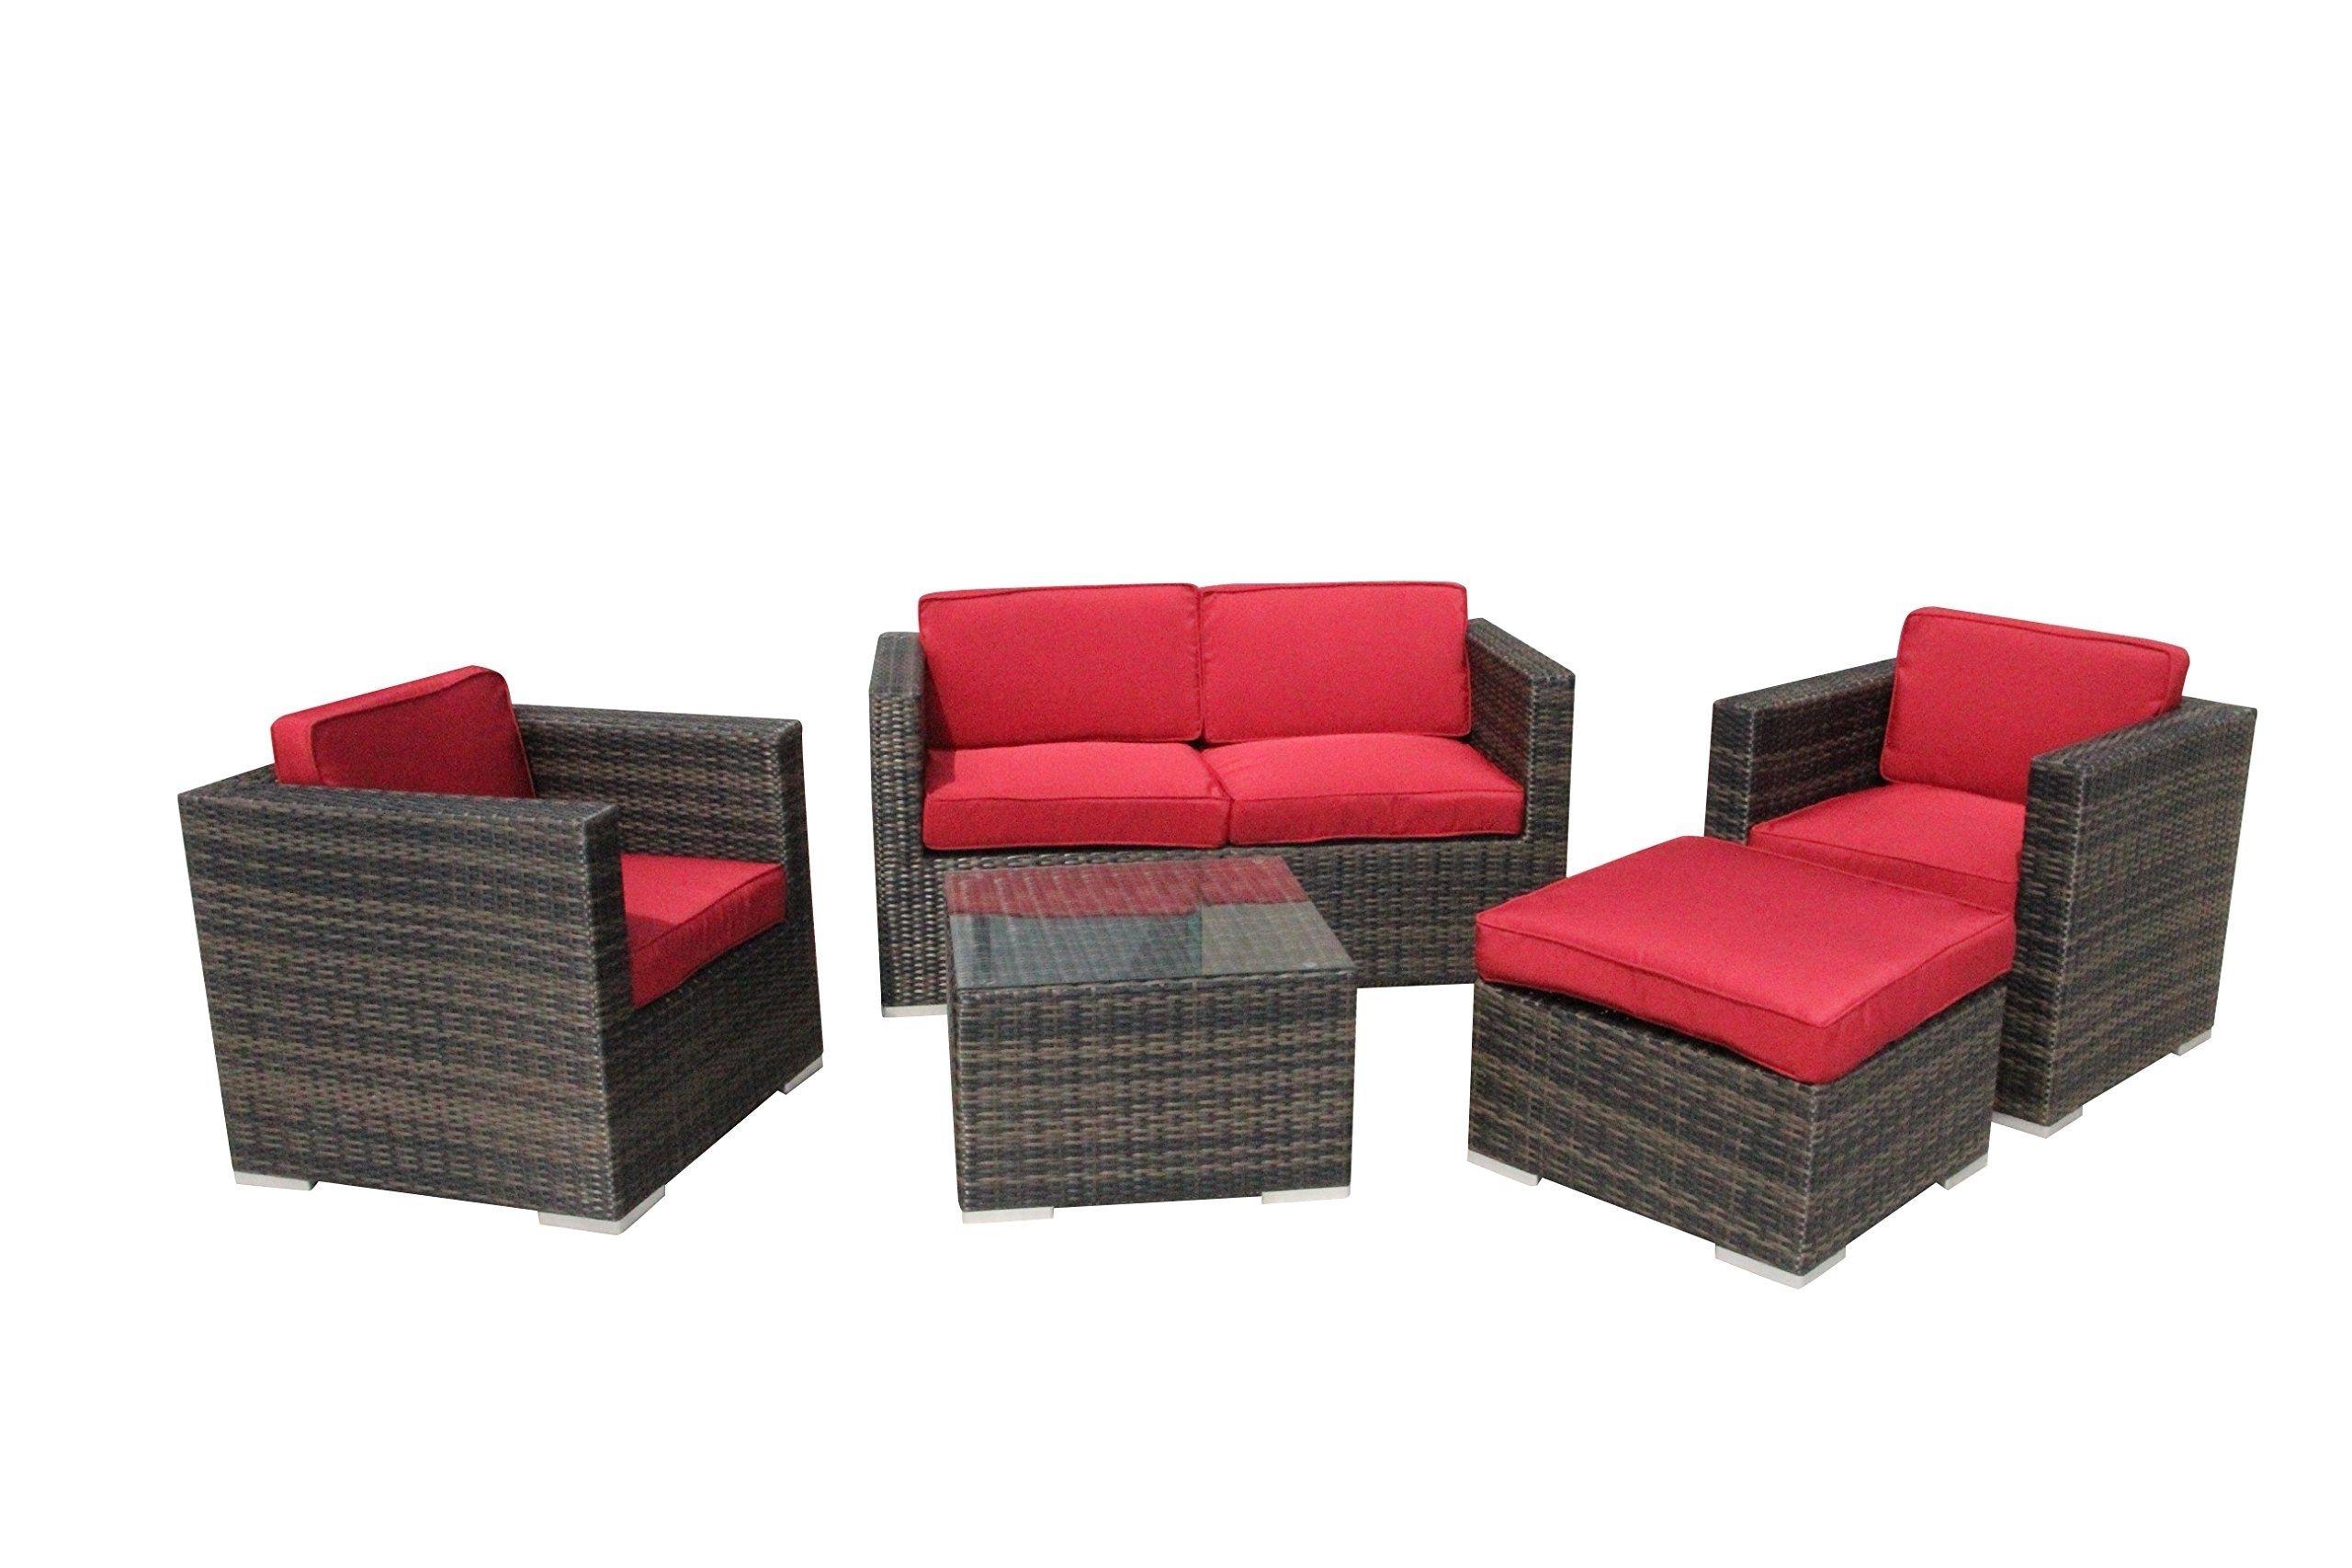 5 Piece Conversation Set Patio Sofa Set Red — Read More At The Regarding Newest Nfm Patio Conversation Sets (View 13 of 15)